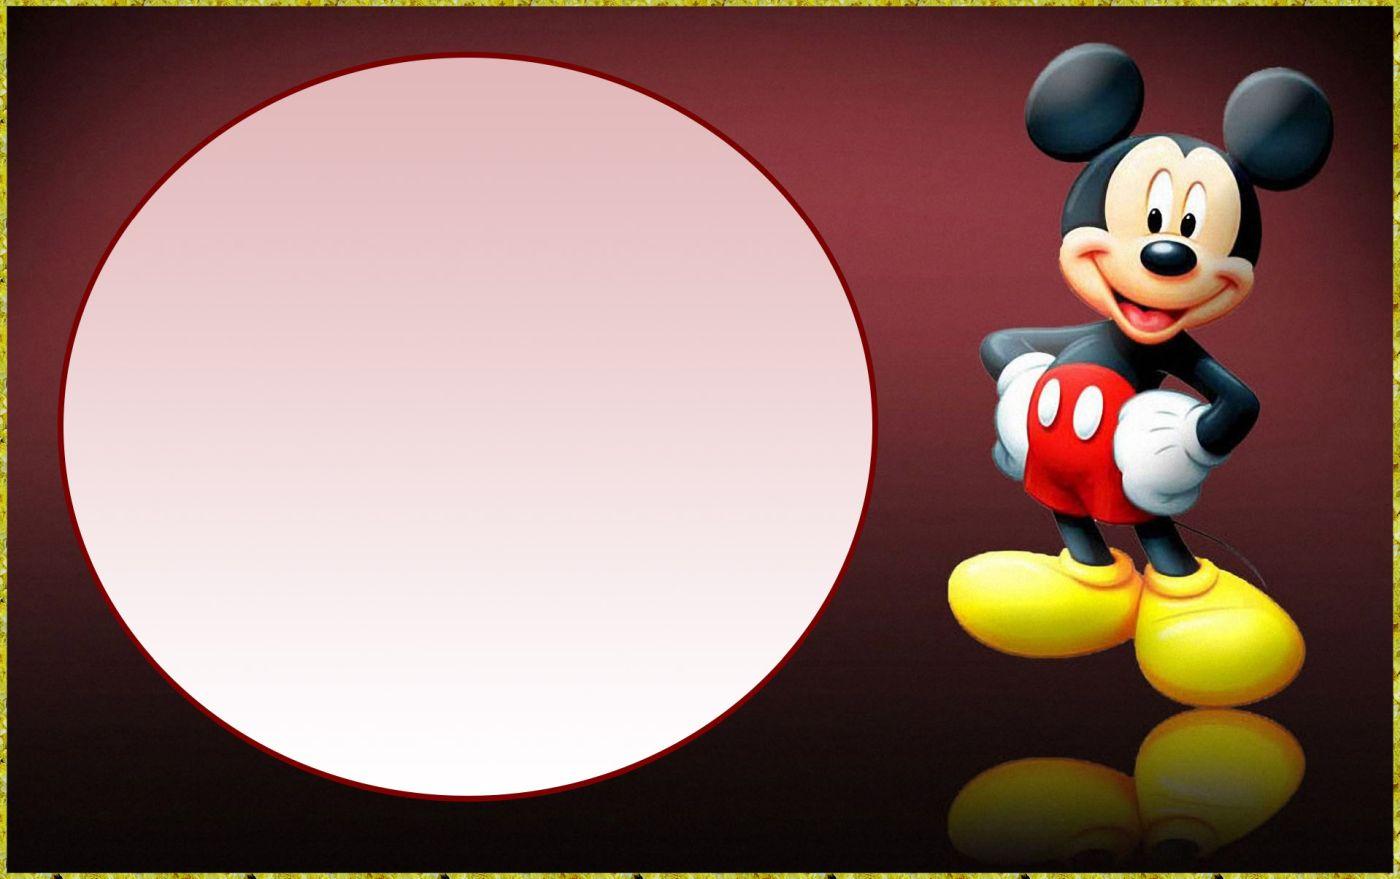 photo regarding Printable Mickey Mouse Invitations named Mickey Mouse Cost-free Printable Invitation Templates